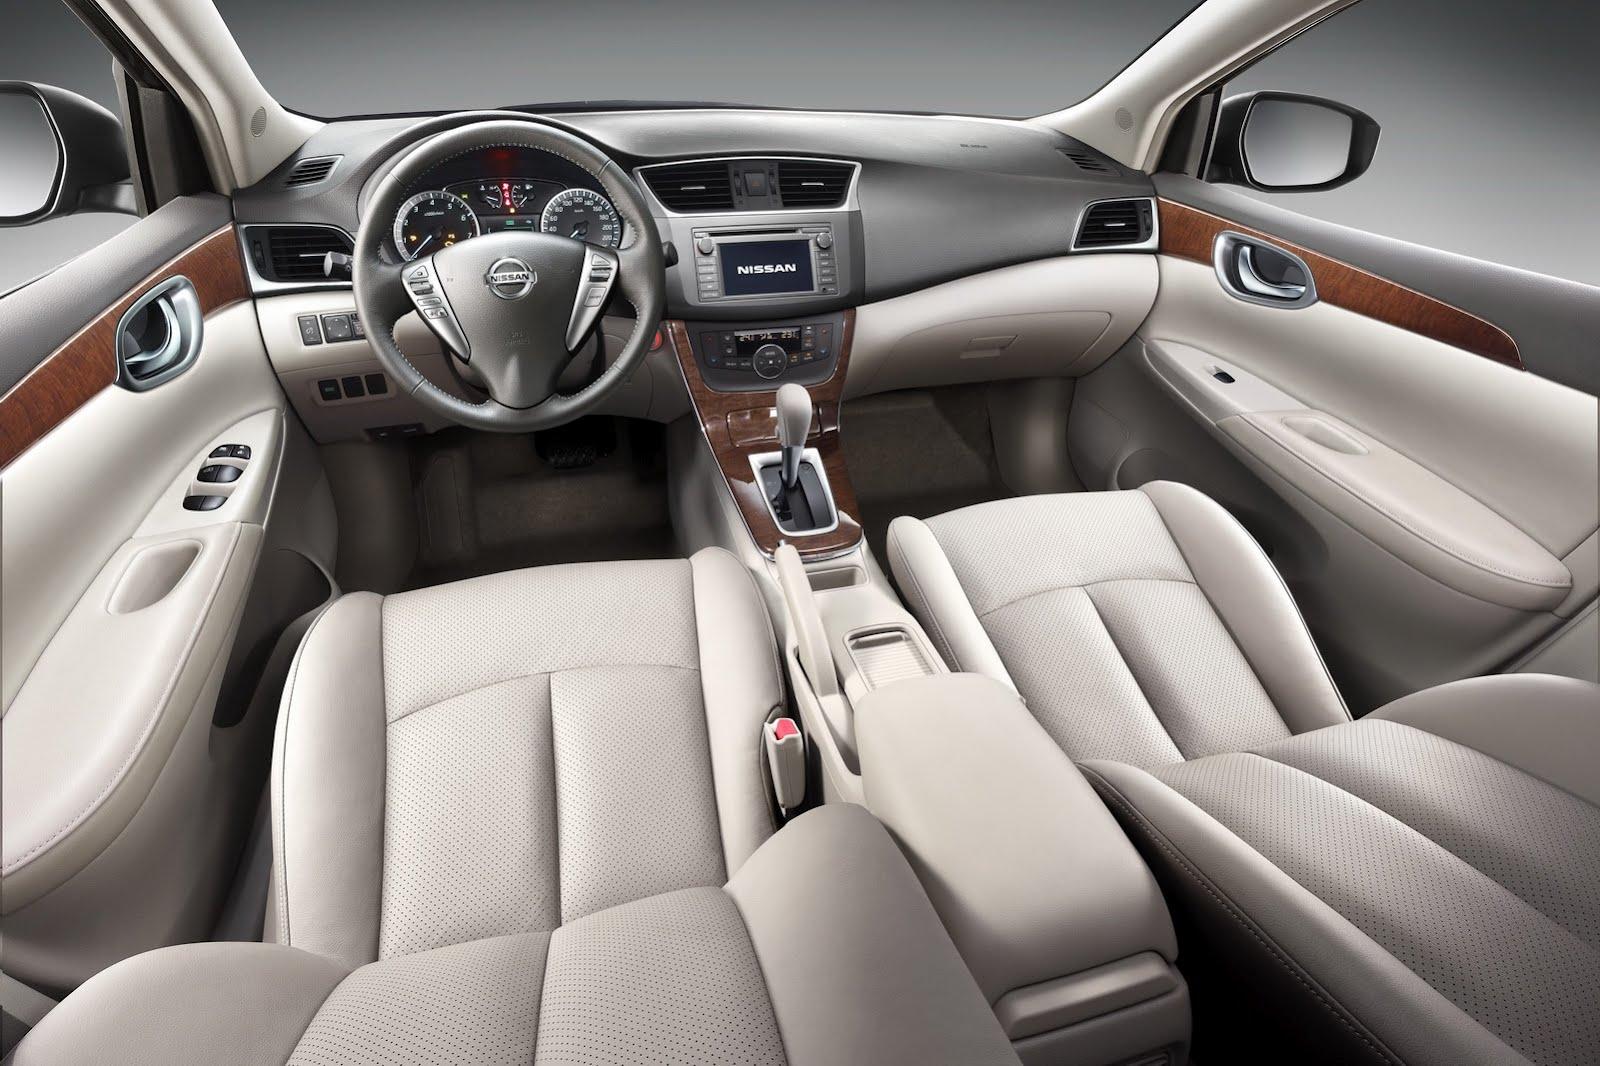 http://3.bp.blogspot.com/-_GF93g5UVXs/UAFAE8j3NtI/AAAAAAAAAF0/lBHsdjylj-E/s1600/2013-Nissan-Sentra-interior.jpg